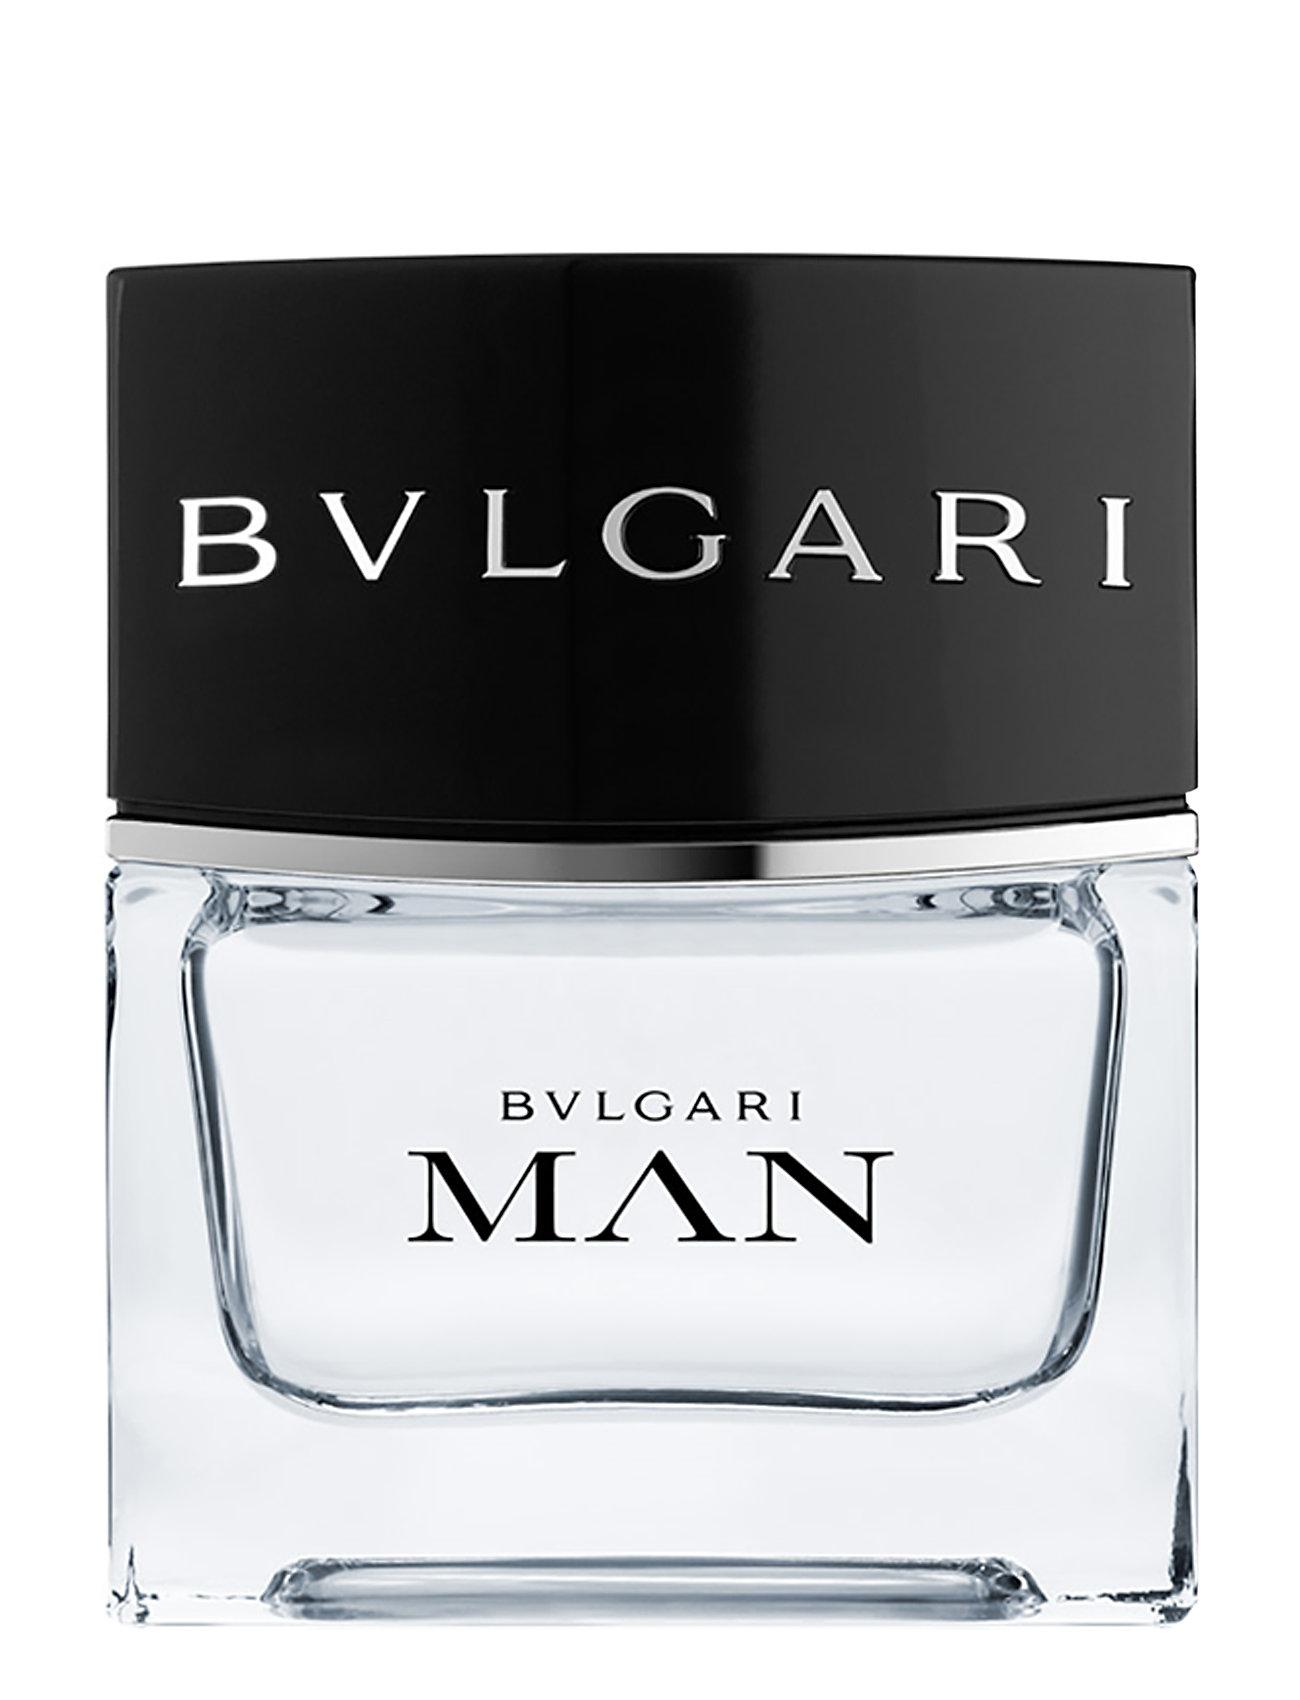 BVLGARI B. MAN EdT 30ml - CLEAR